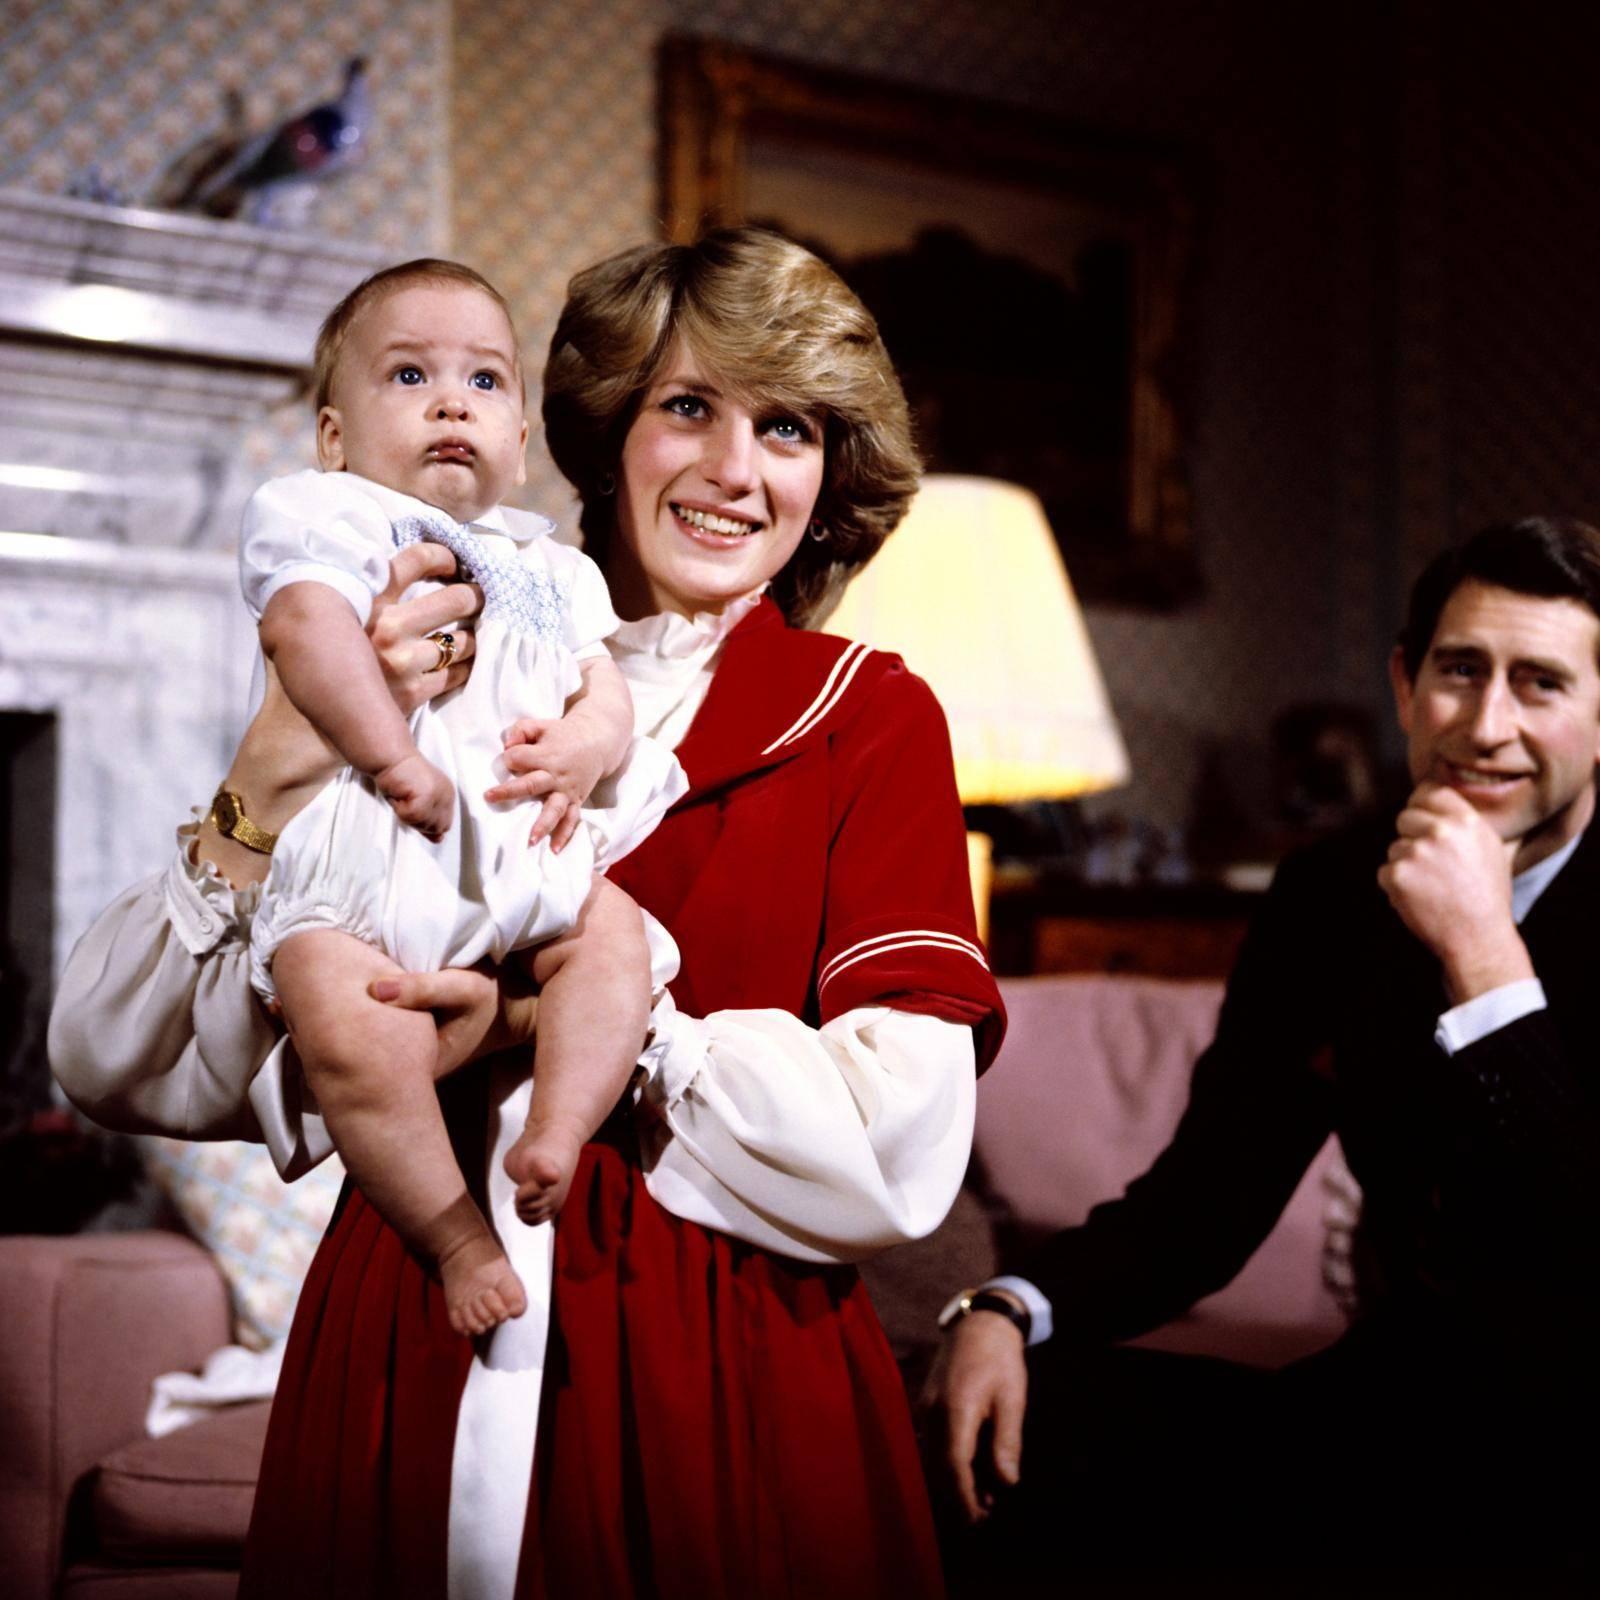 The Prince Charles and Princess Diana at Buckingham Palace